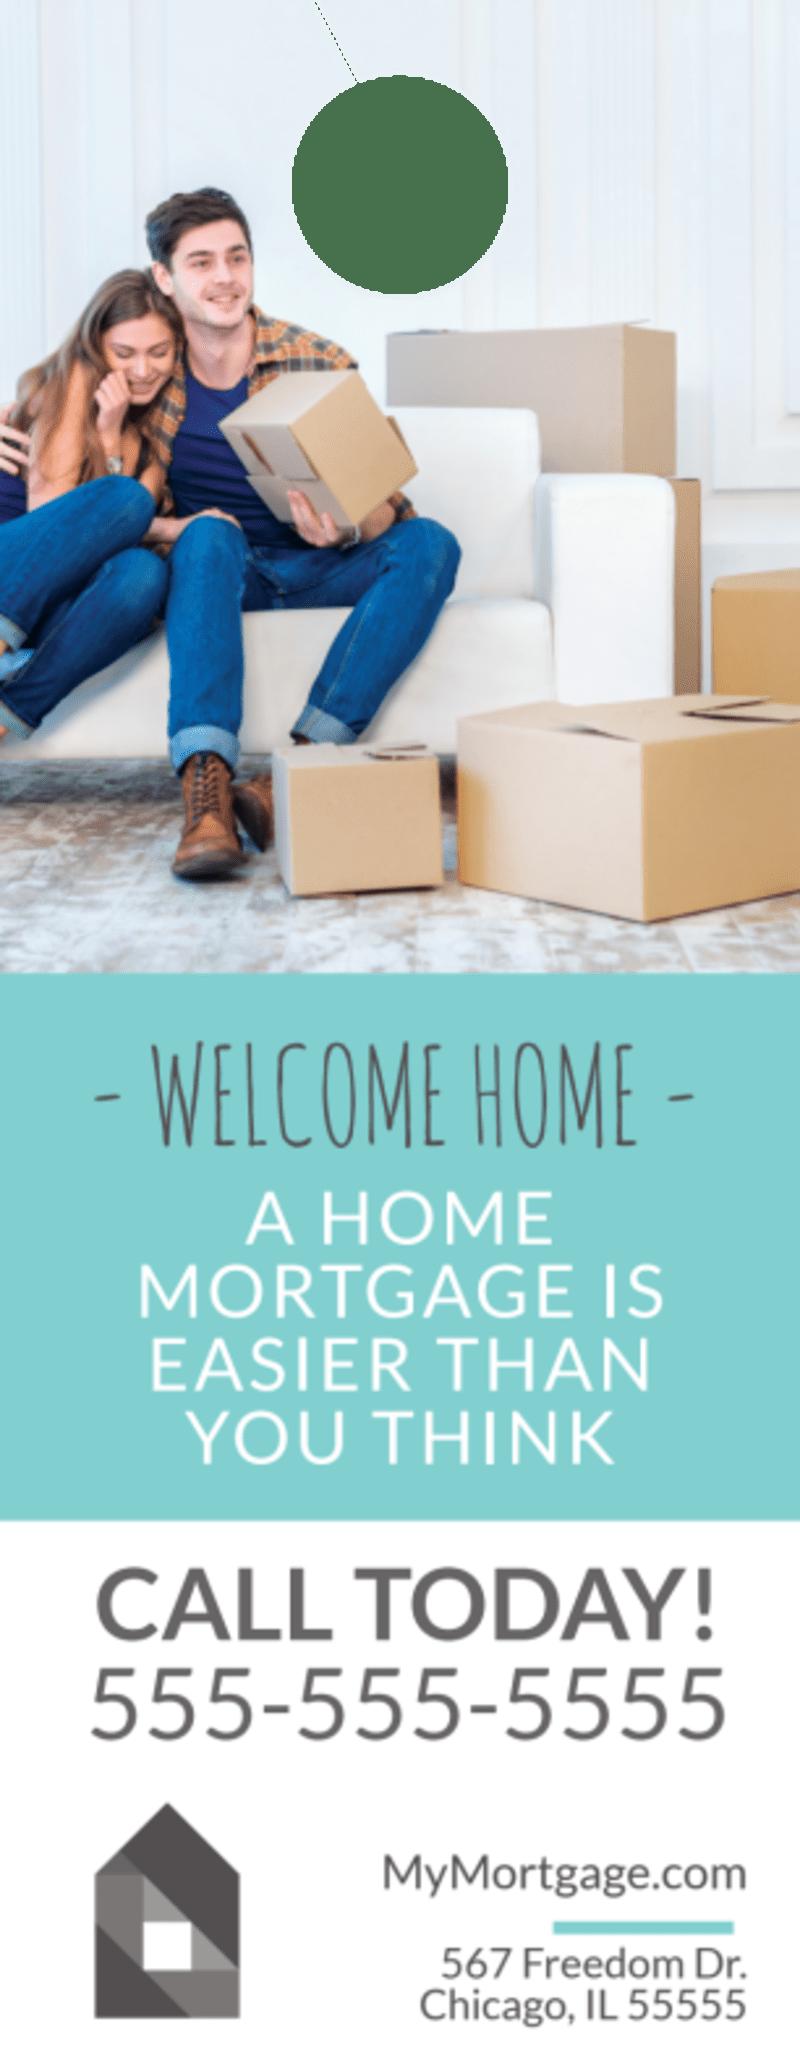 Home Mortgage Door Hanger Template Preview 2